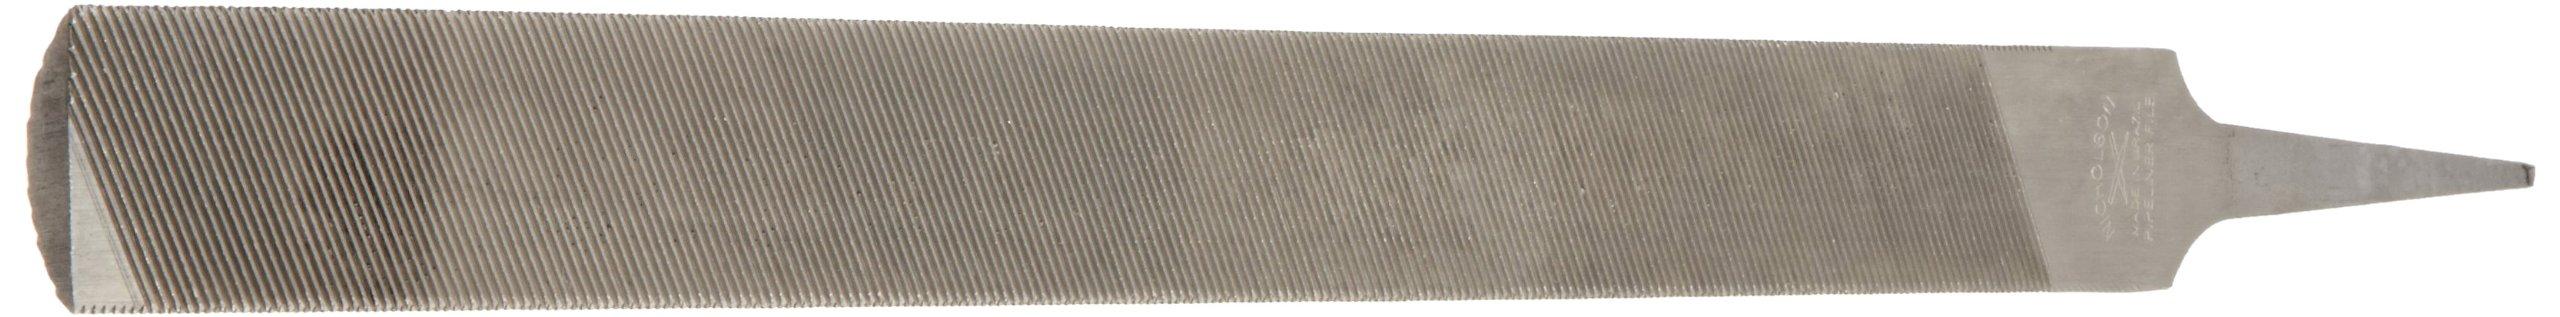 Nicholson Hand File (Boxed), American Pattern, Double Cut (Single Cut on Back/Flat Sides), Half-Round, Coarse, 14'' Length